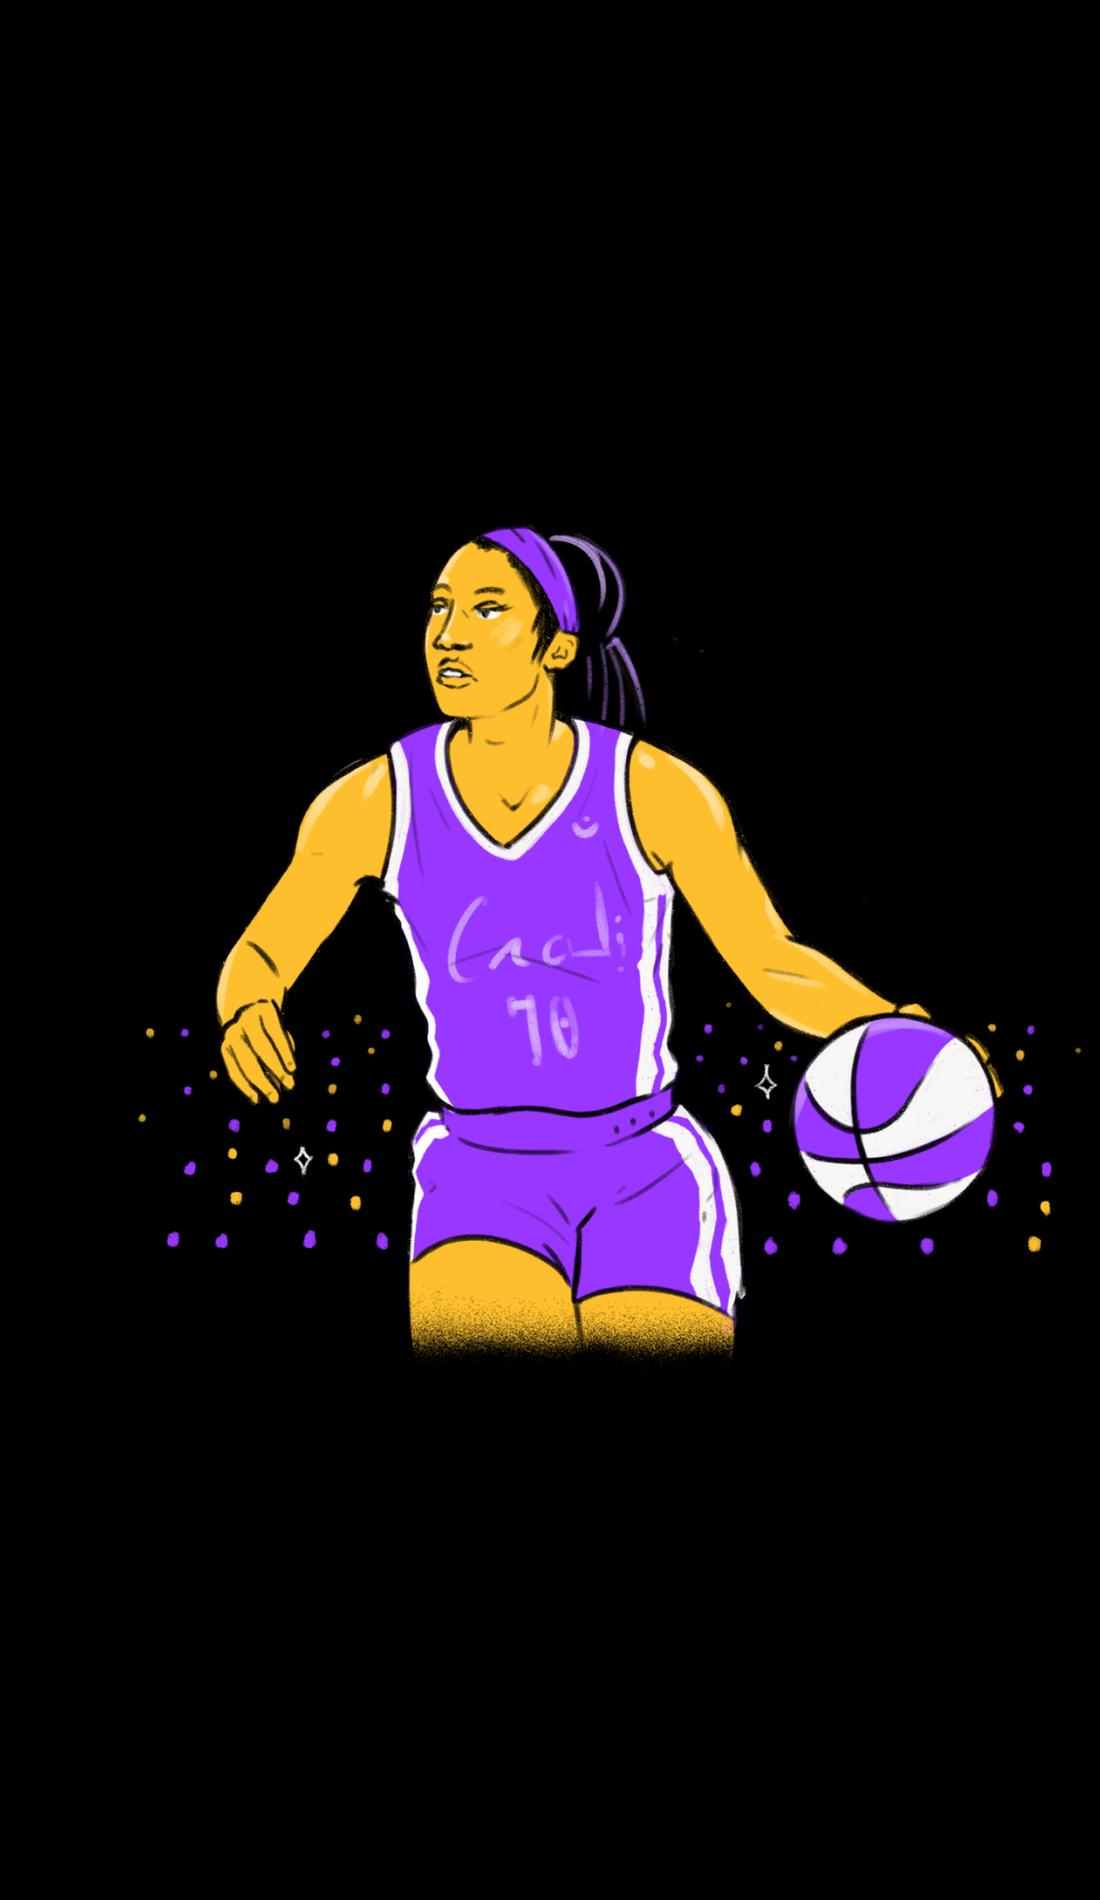 A Loyola Maryland Greyhounds Womens Basketball live event